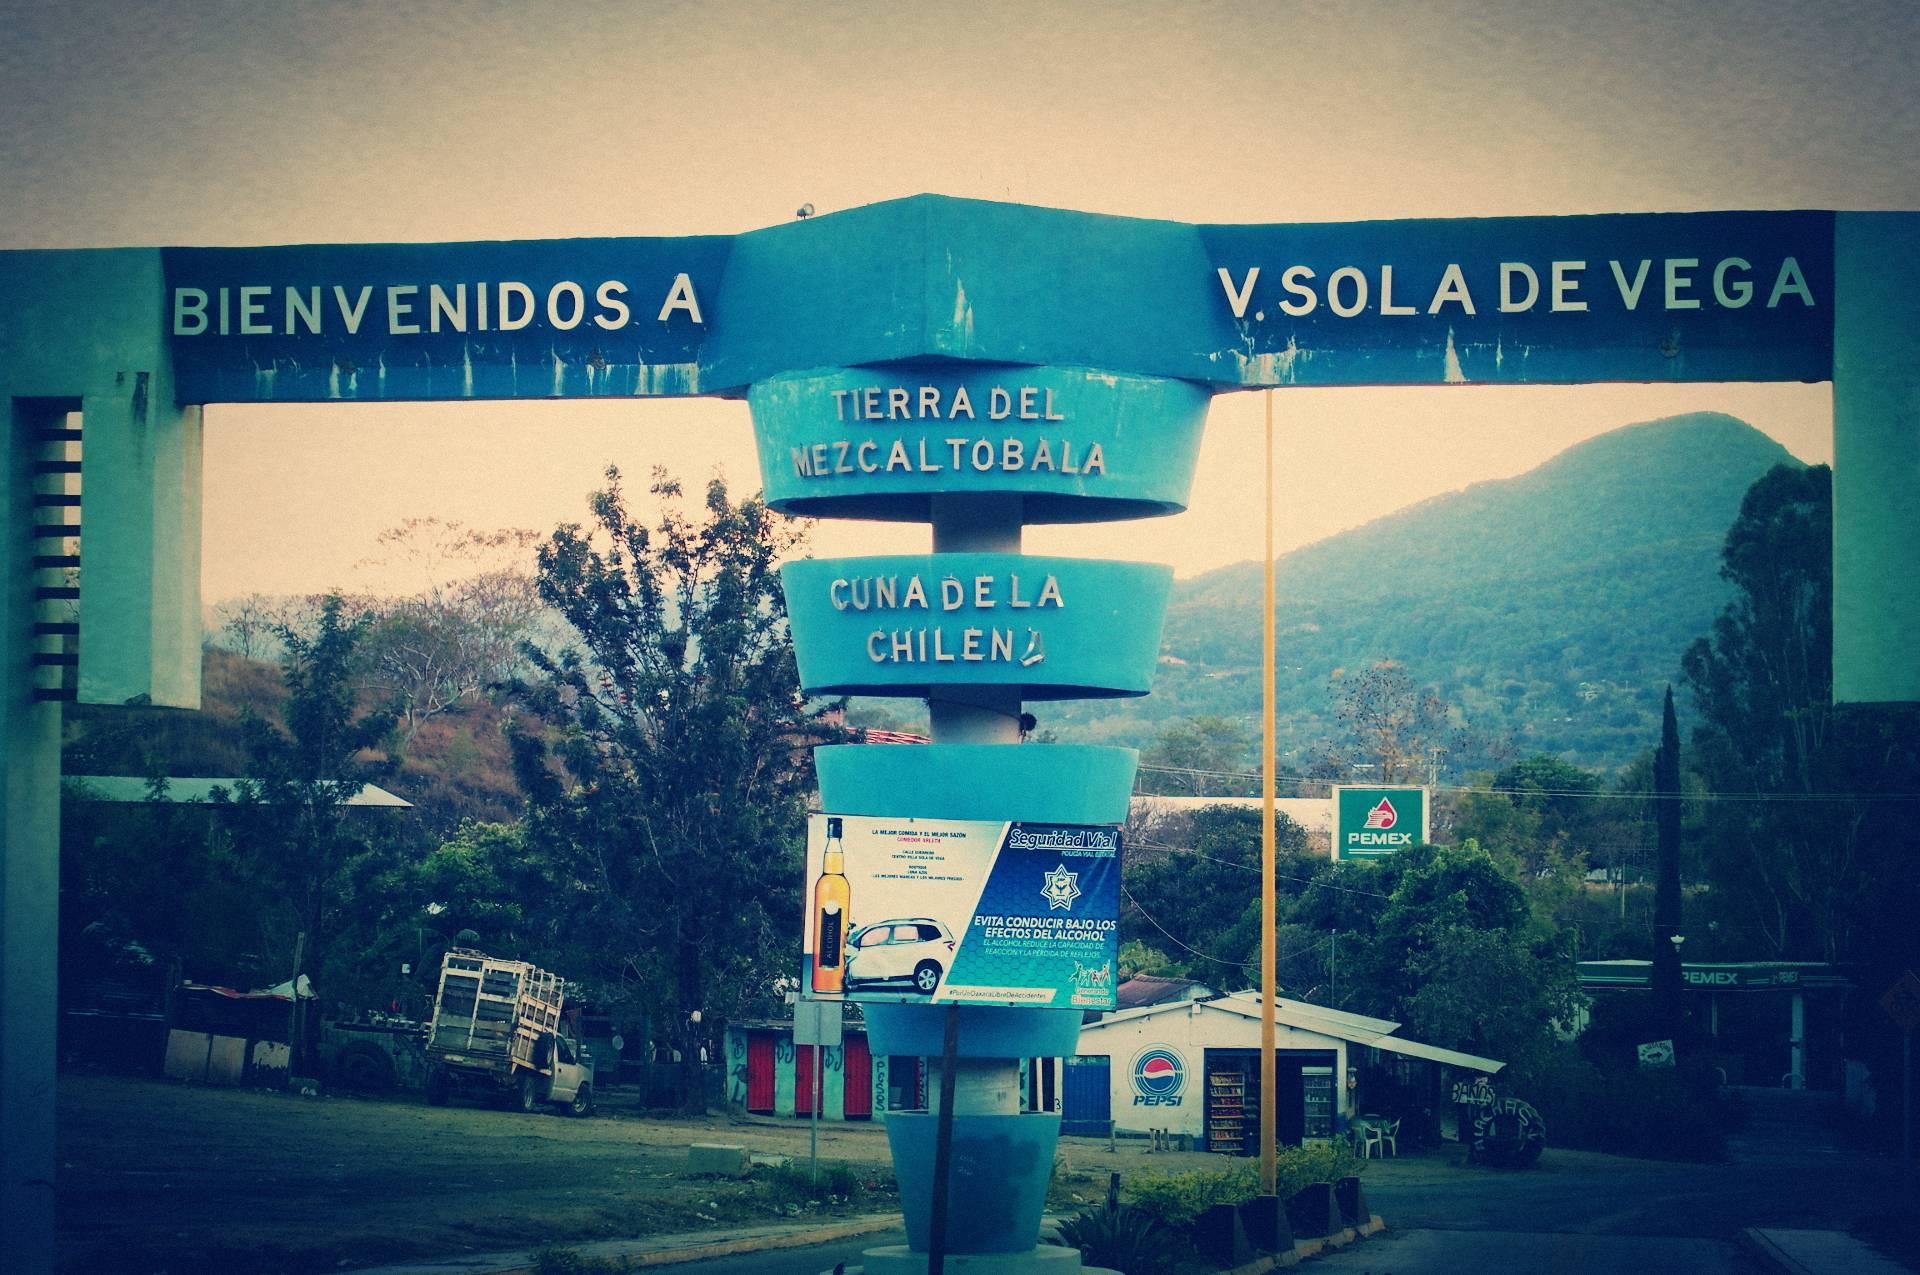 Entrance Sola the Vega.